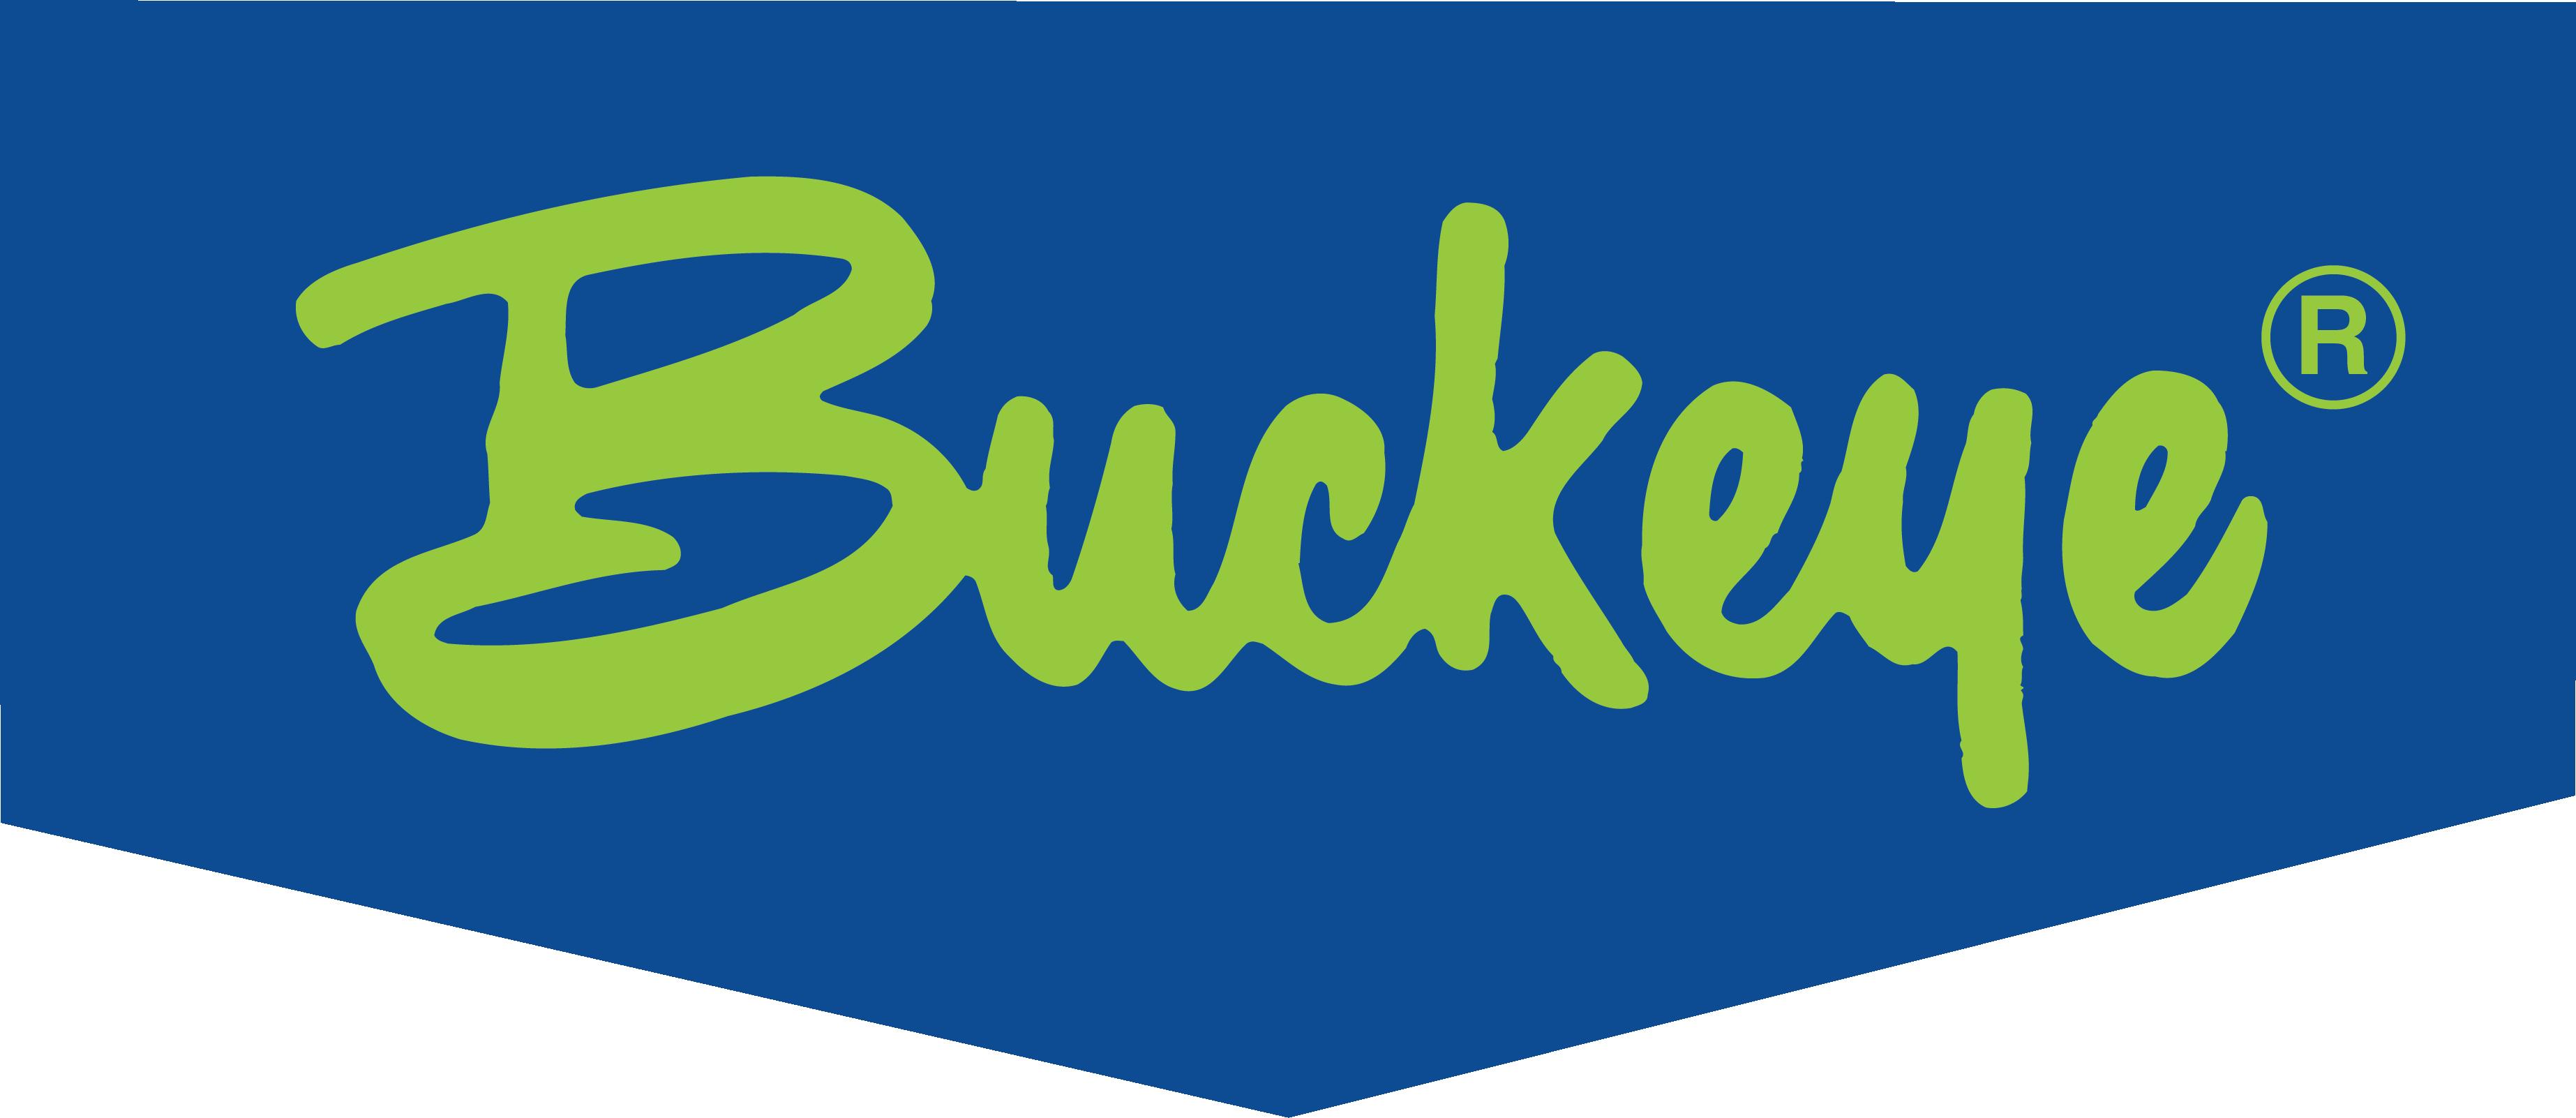 Mbns18 buckeye international logo microban partner mtime20190225200949